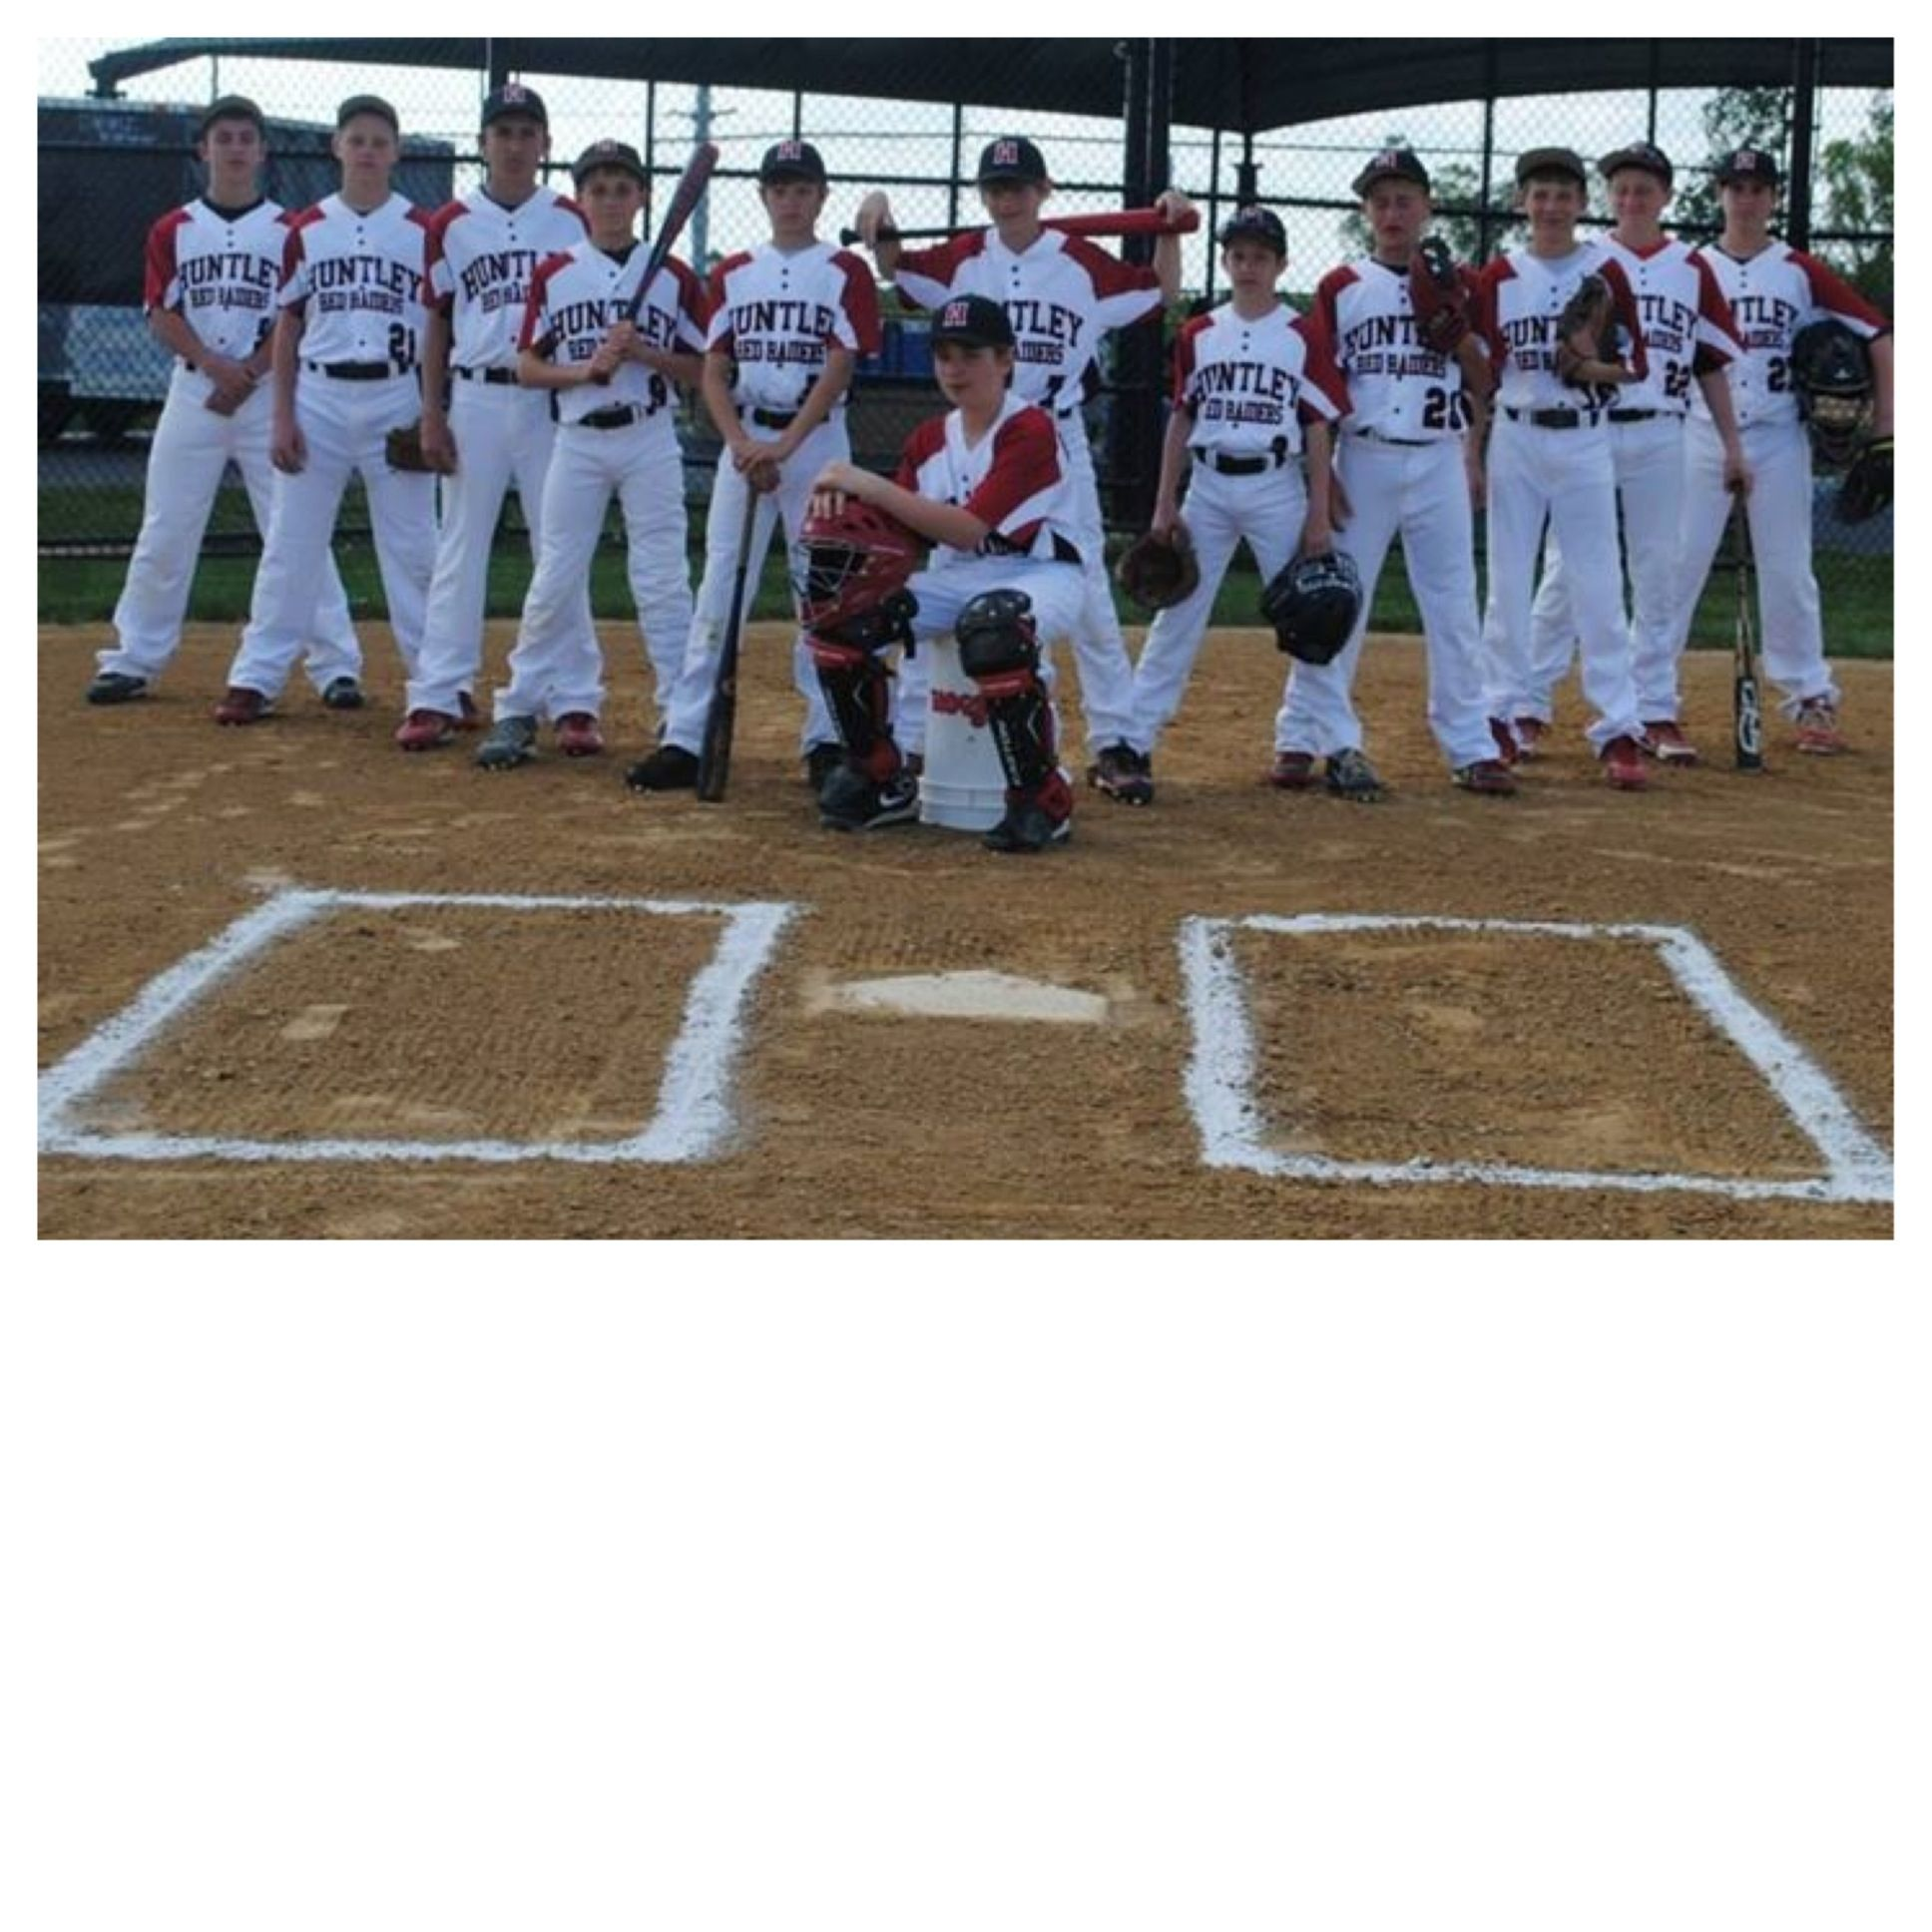 Team Picture Cute Idea For Team Photo Of A Baseball Team Banner Idea Team Pictures Baseball Photography Baseball Banner